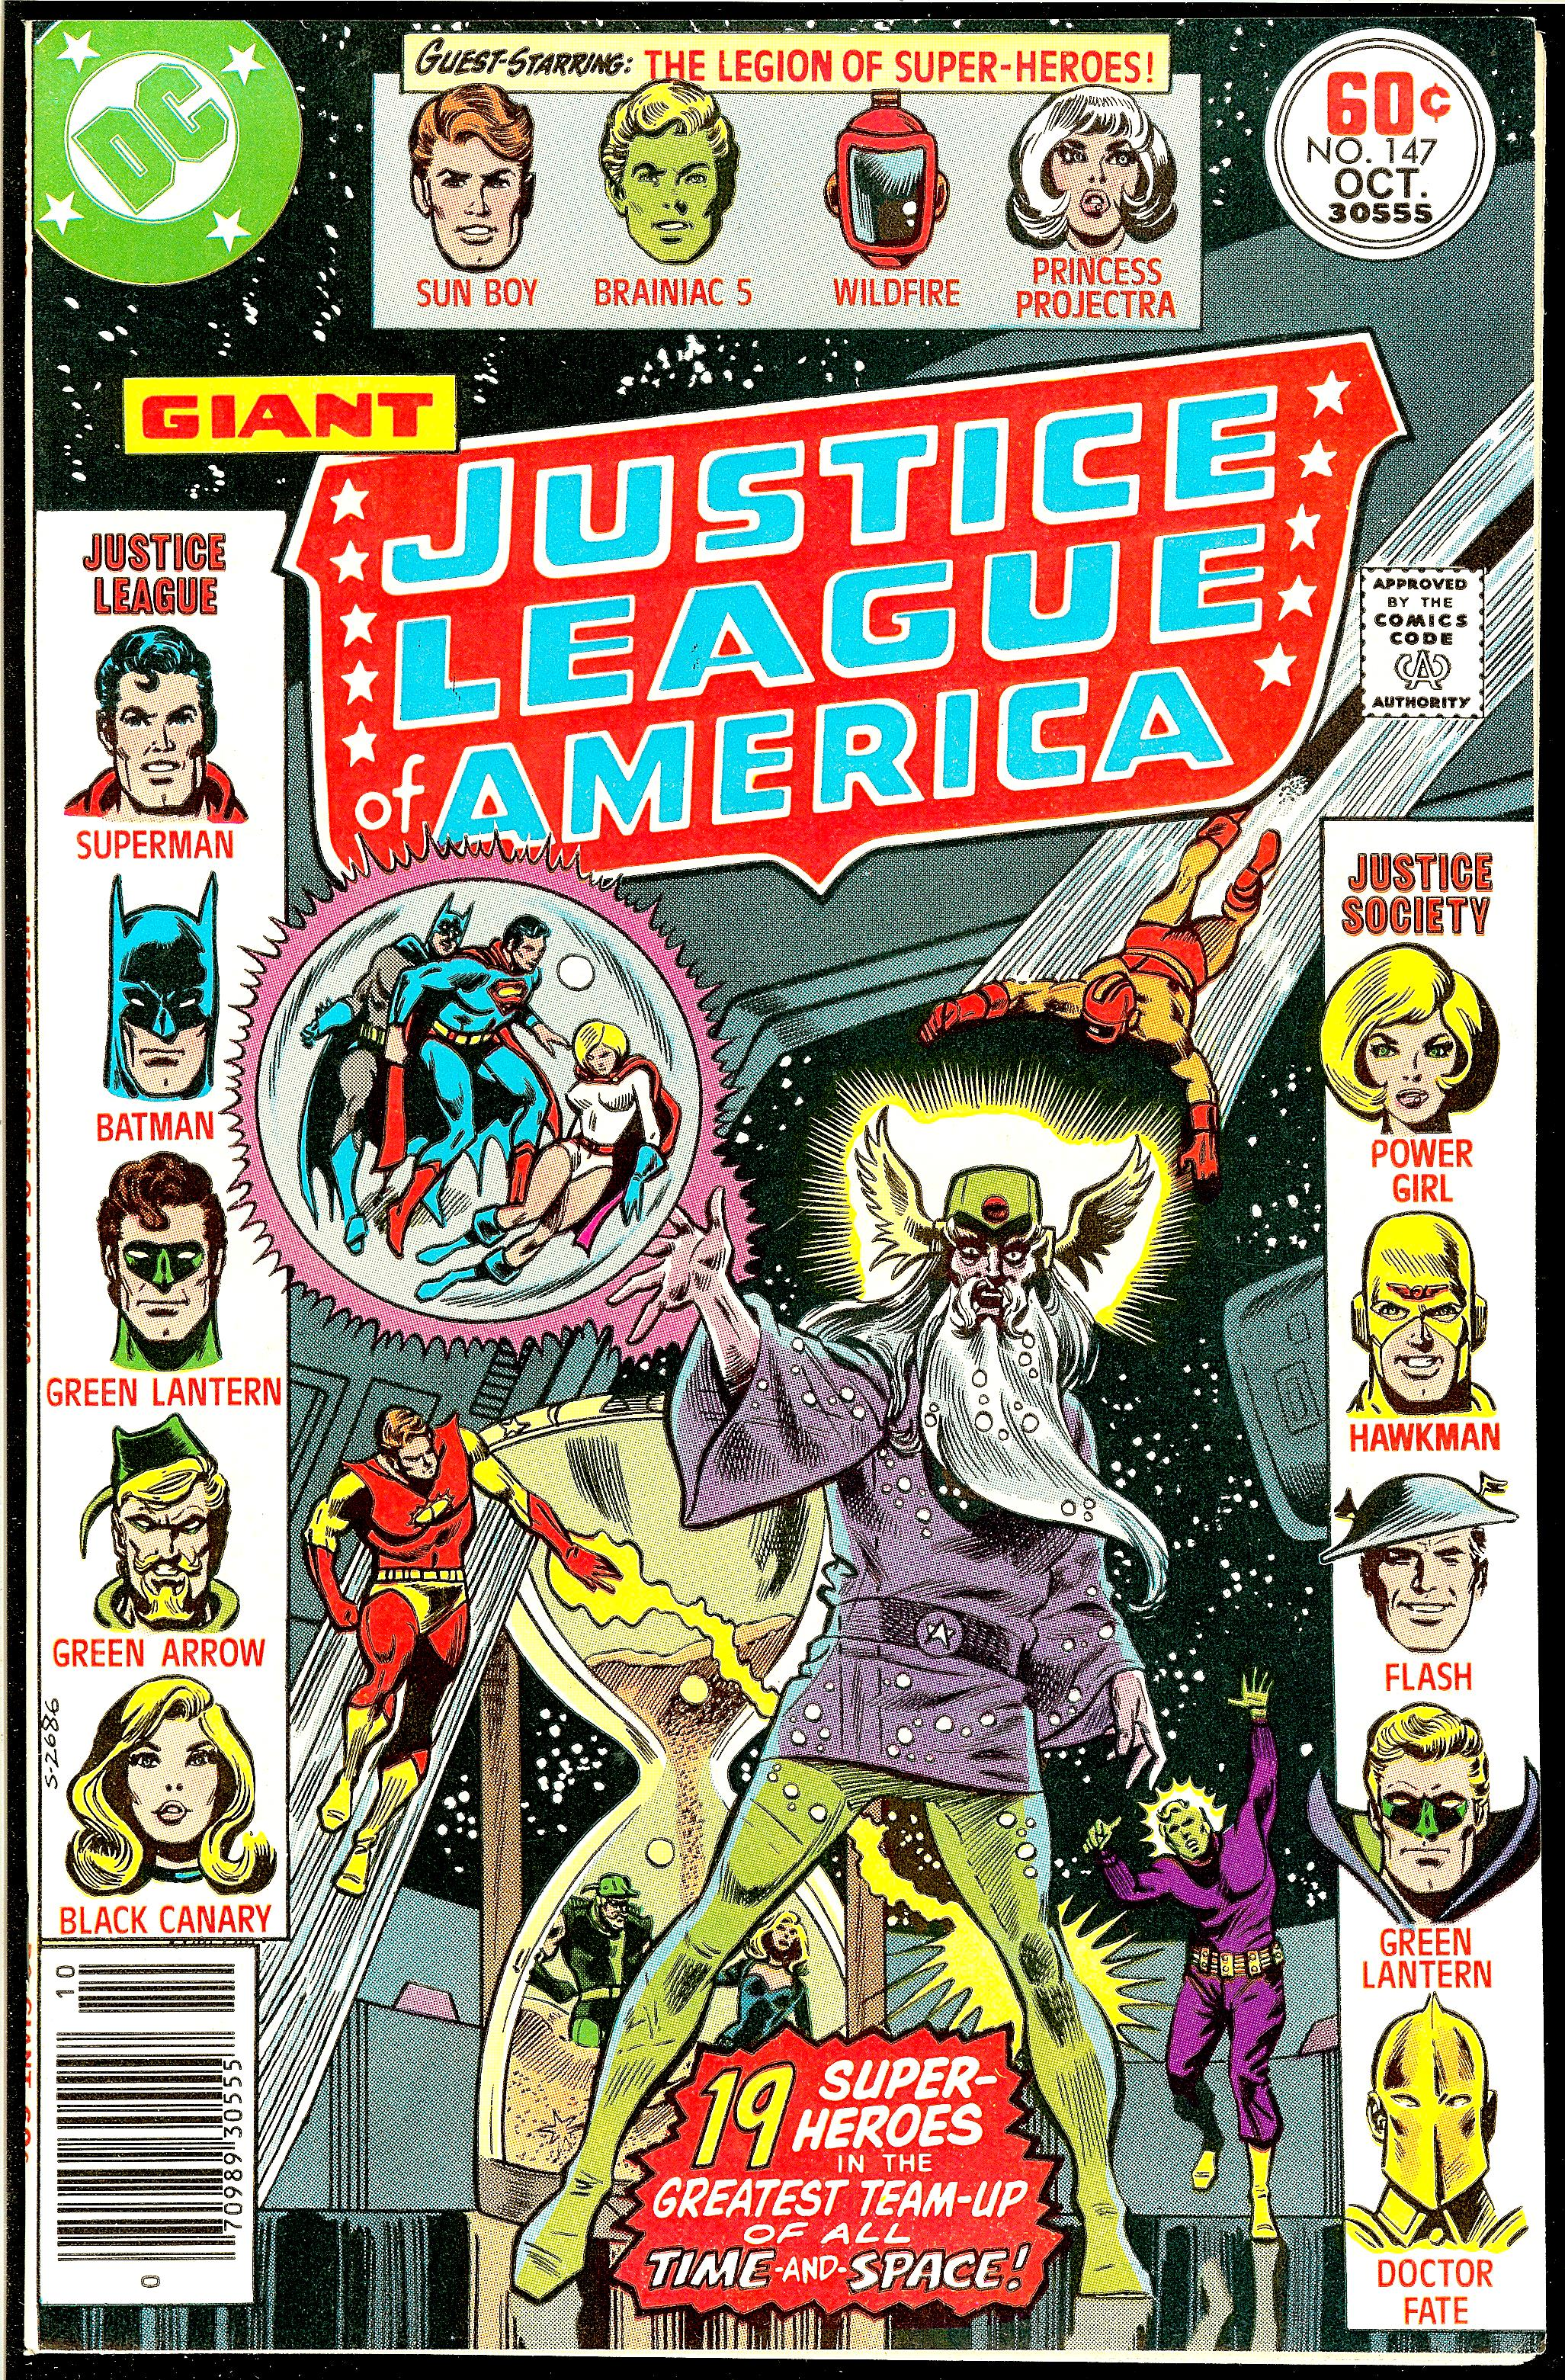 Panini-Justice League-cromos nº 147